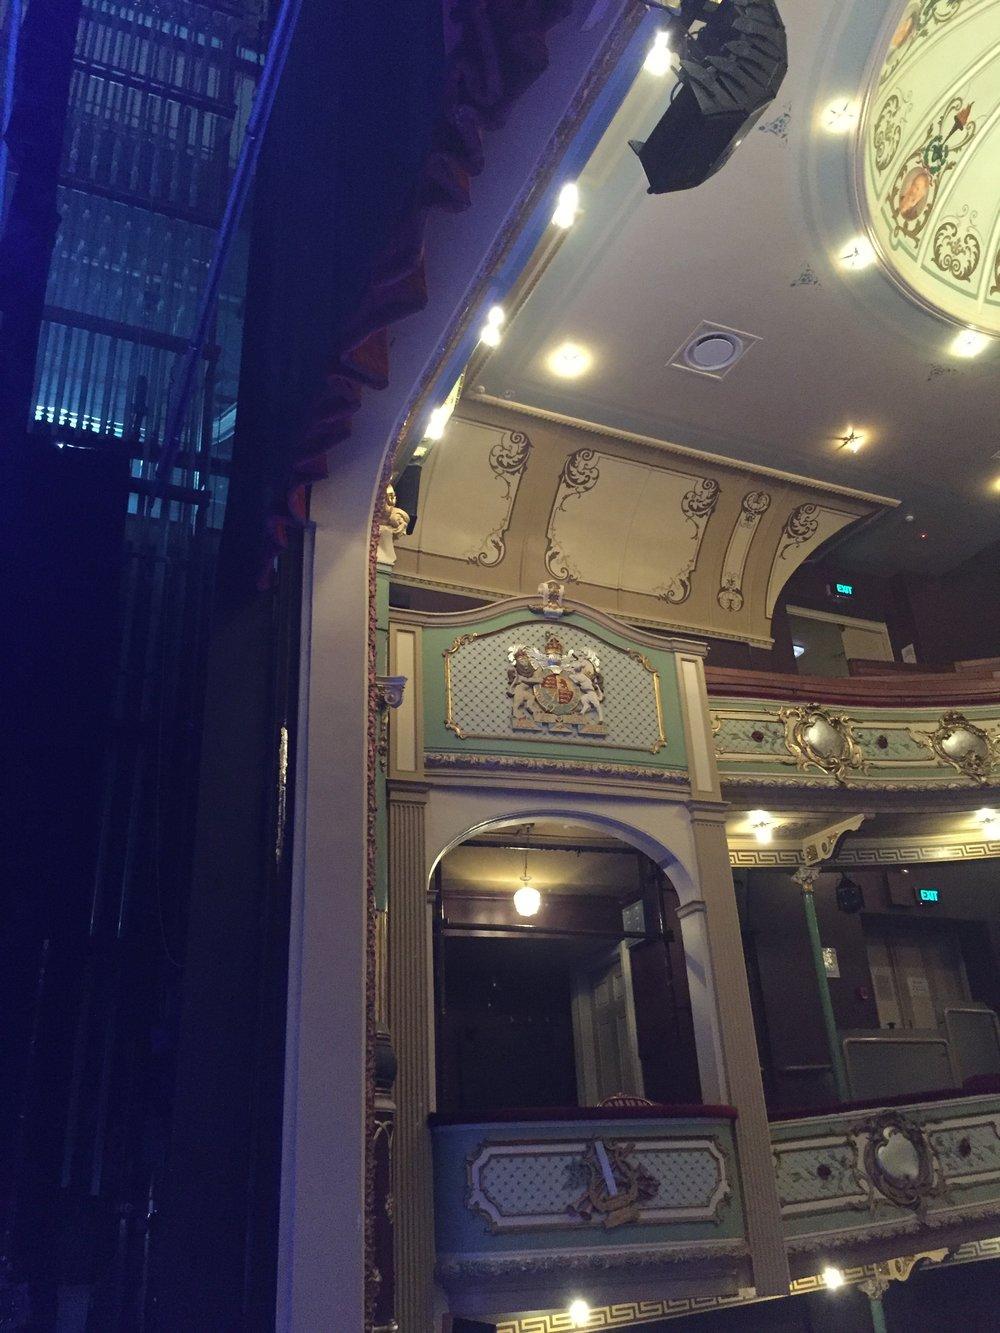 The Royal Theatre in Hobart, Tasmania